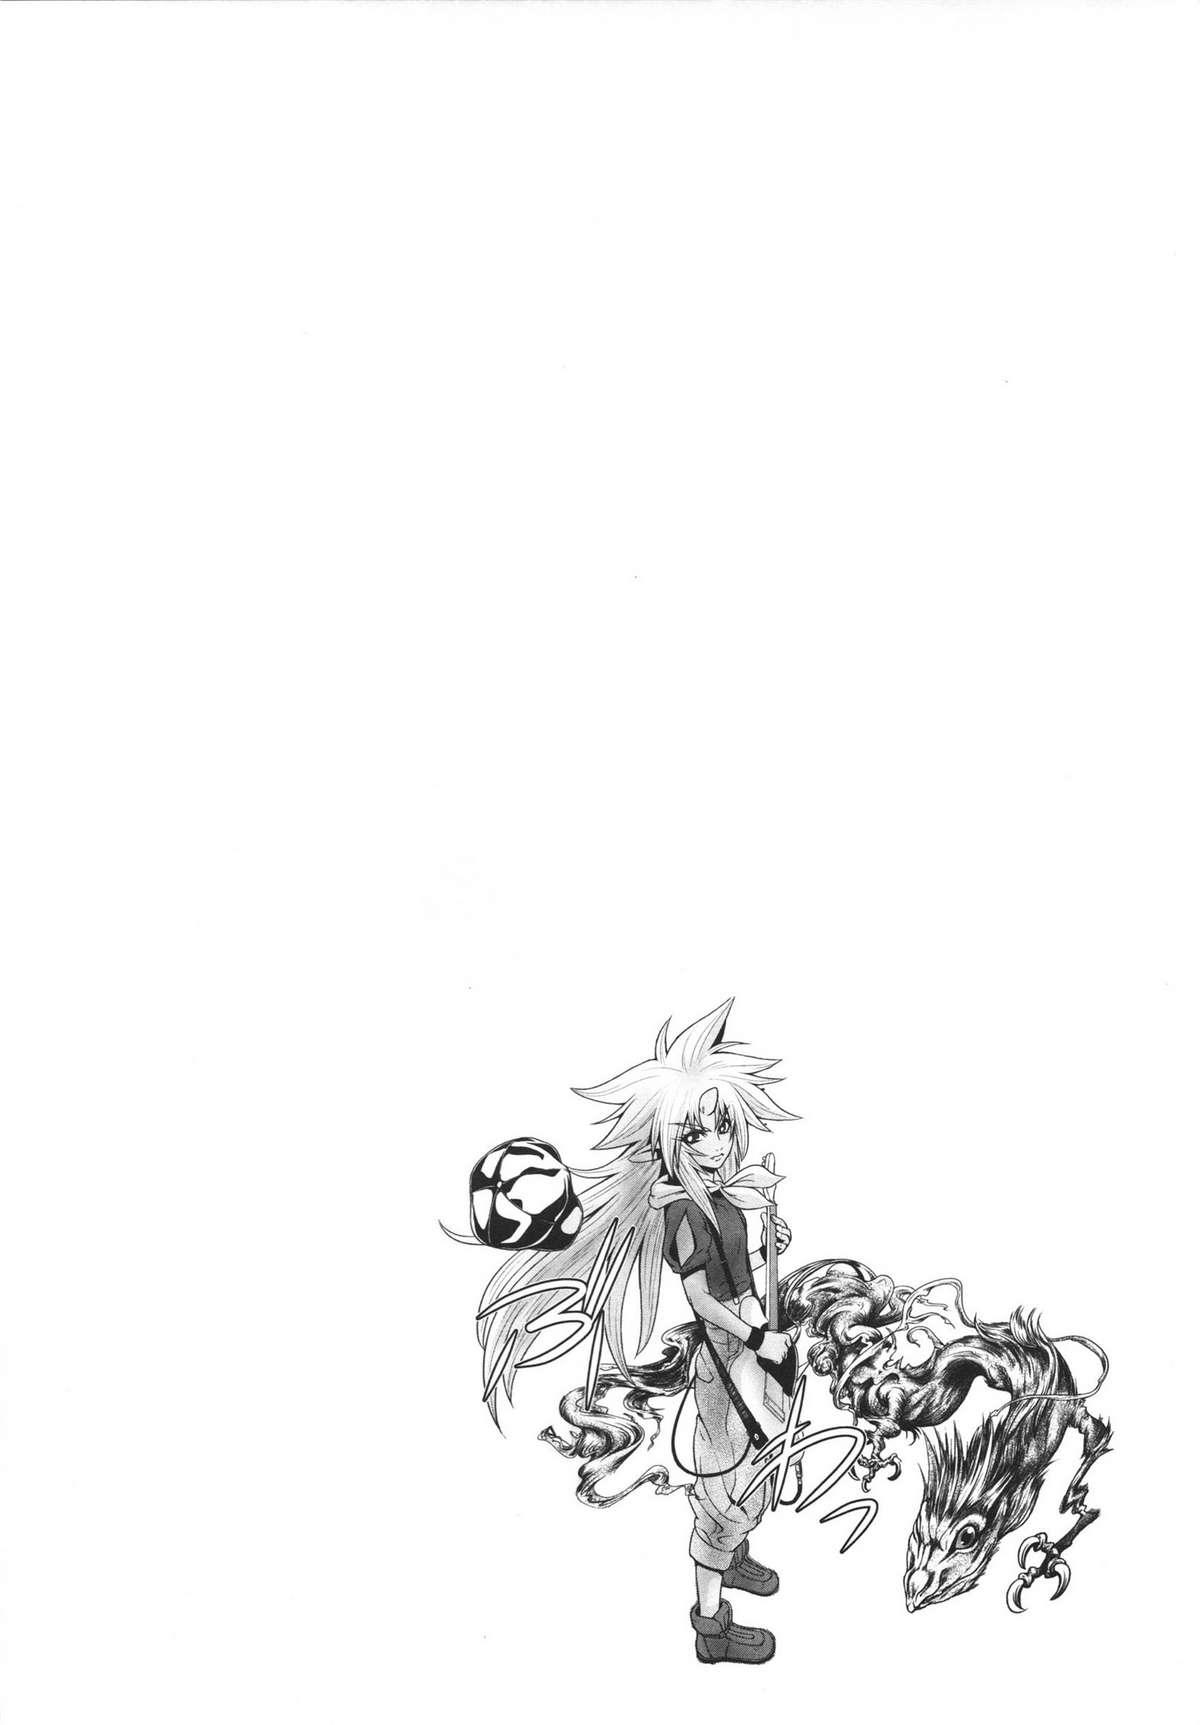 [Kawazuko Chouji] m7 -Minor Seven- Jou 119